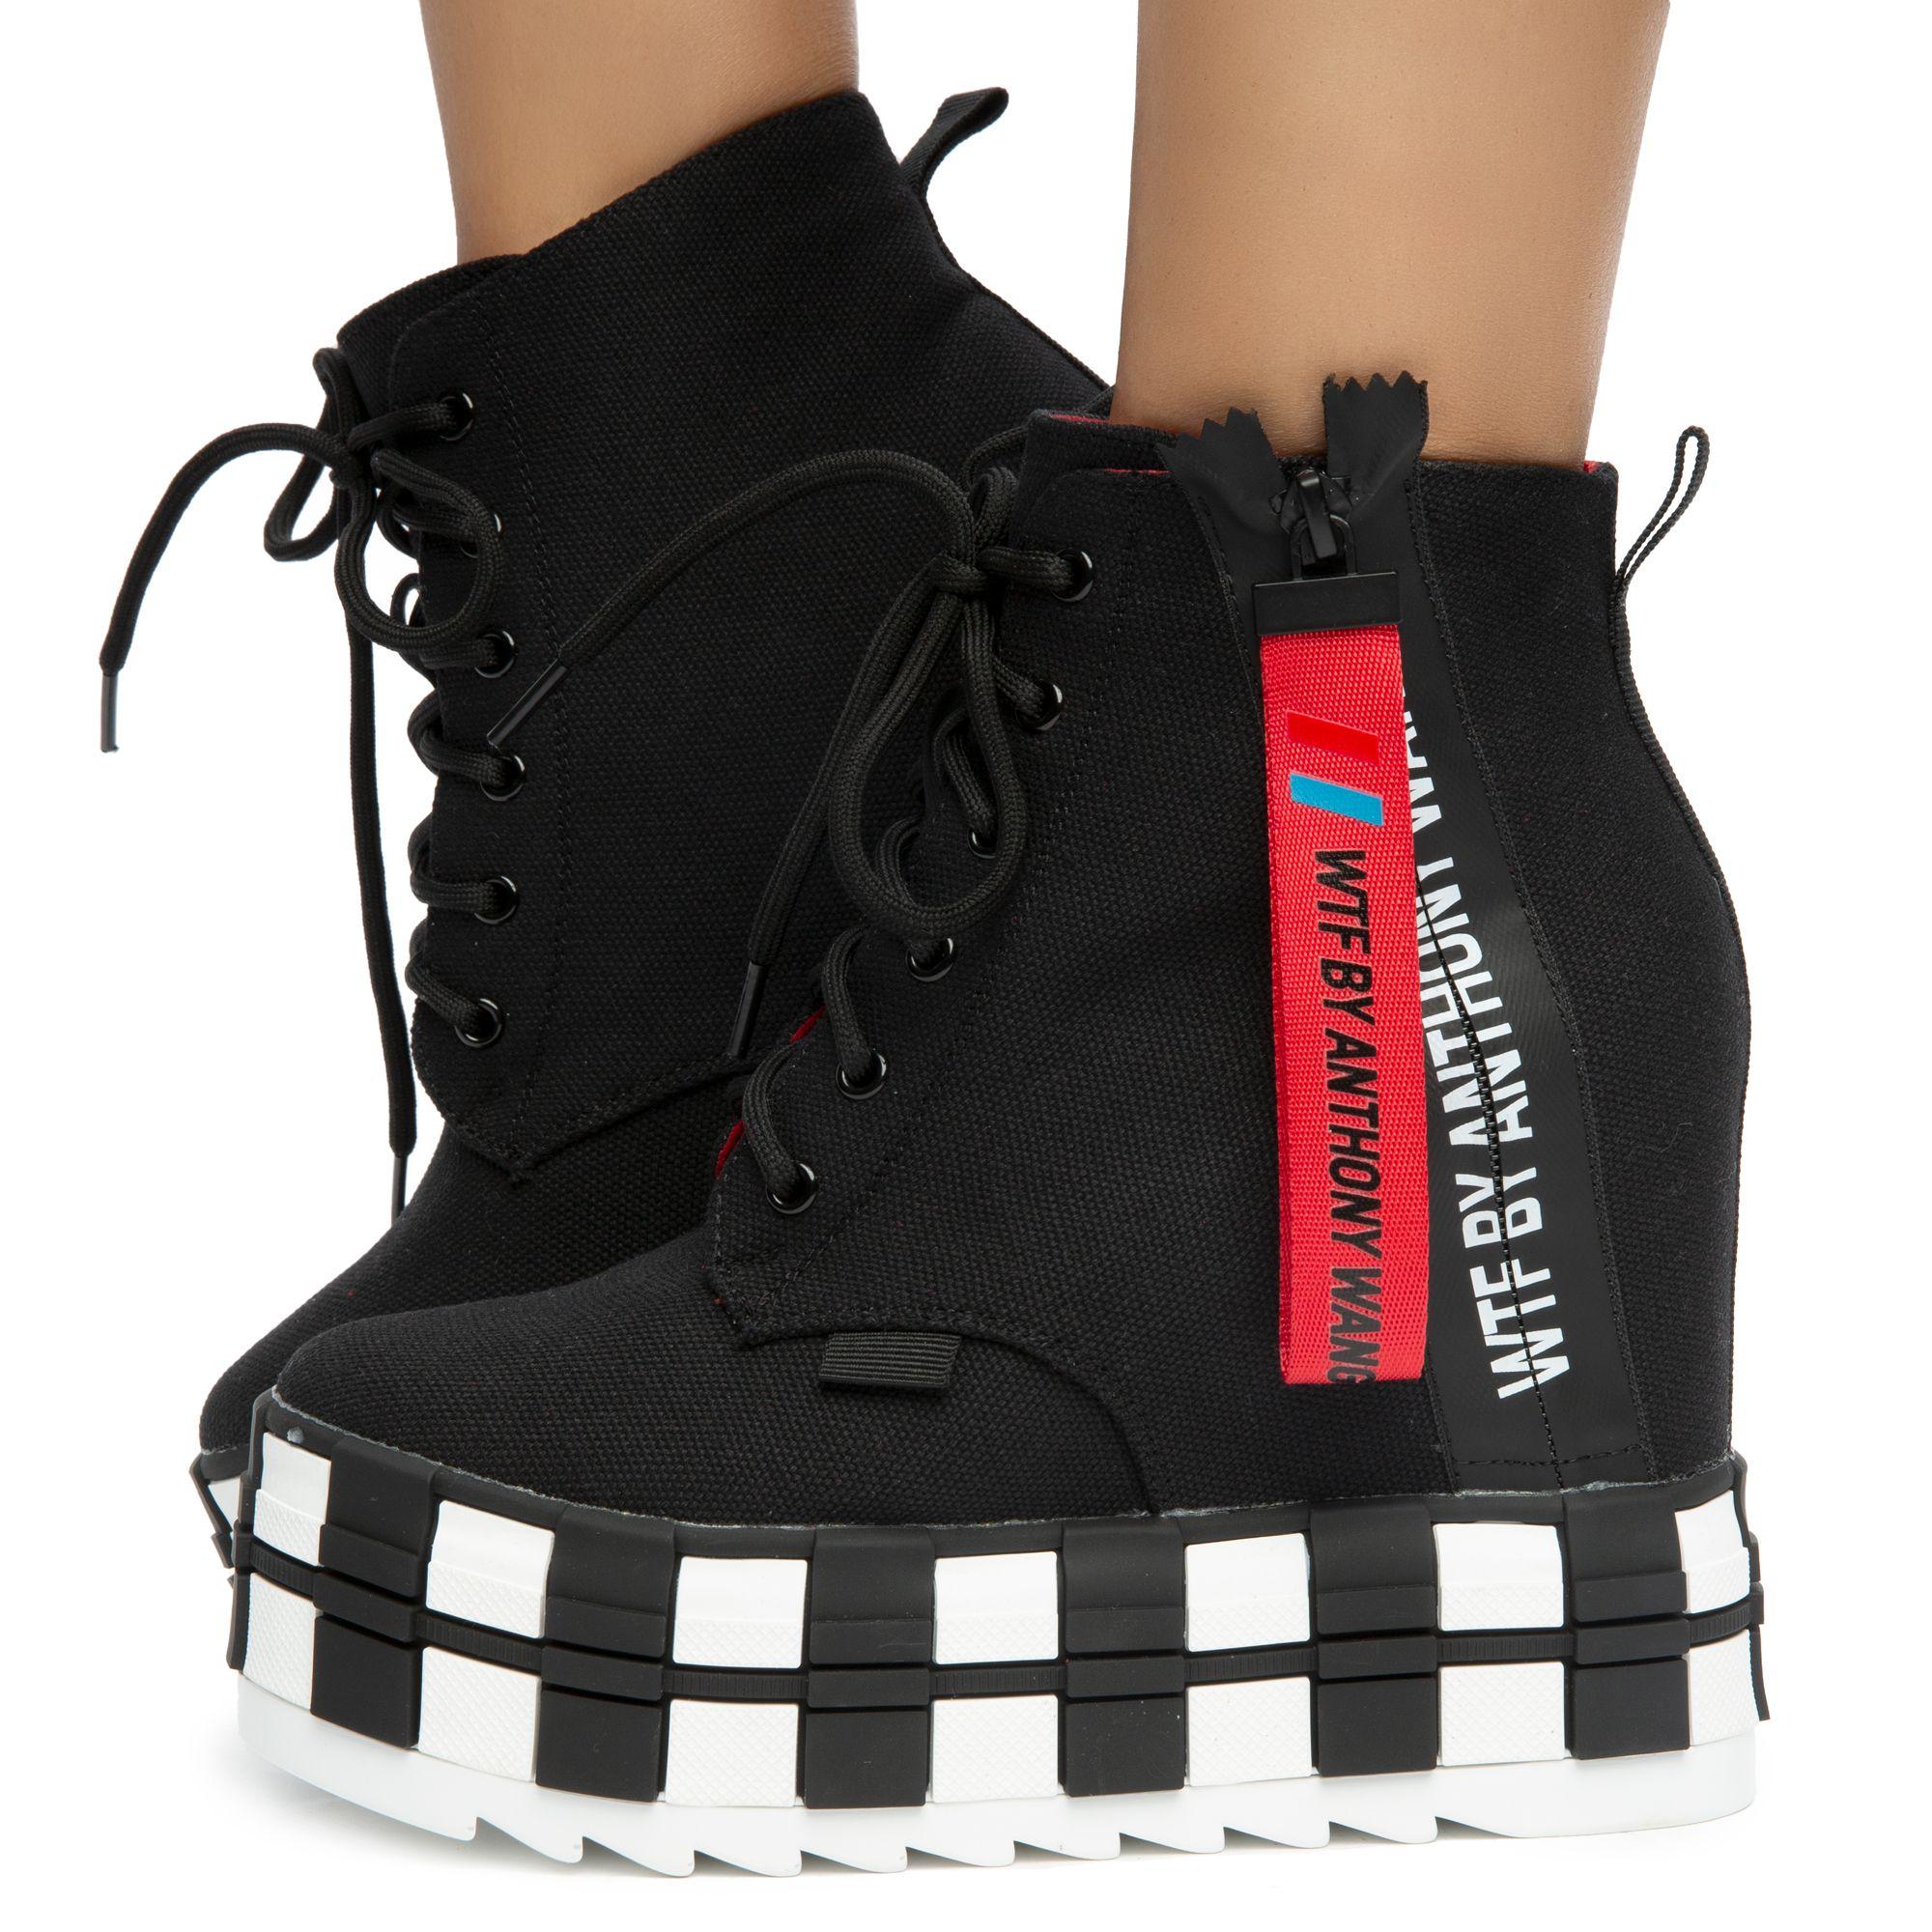 Minson Wedge Sneakers Black Fabric